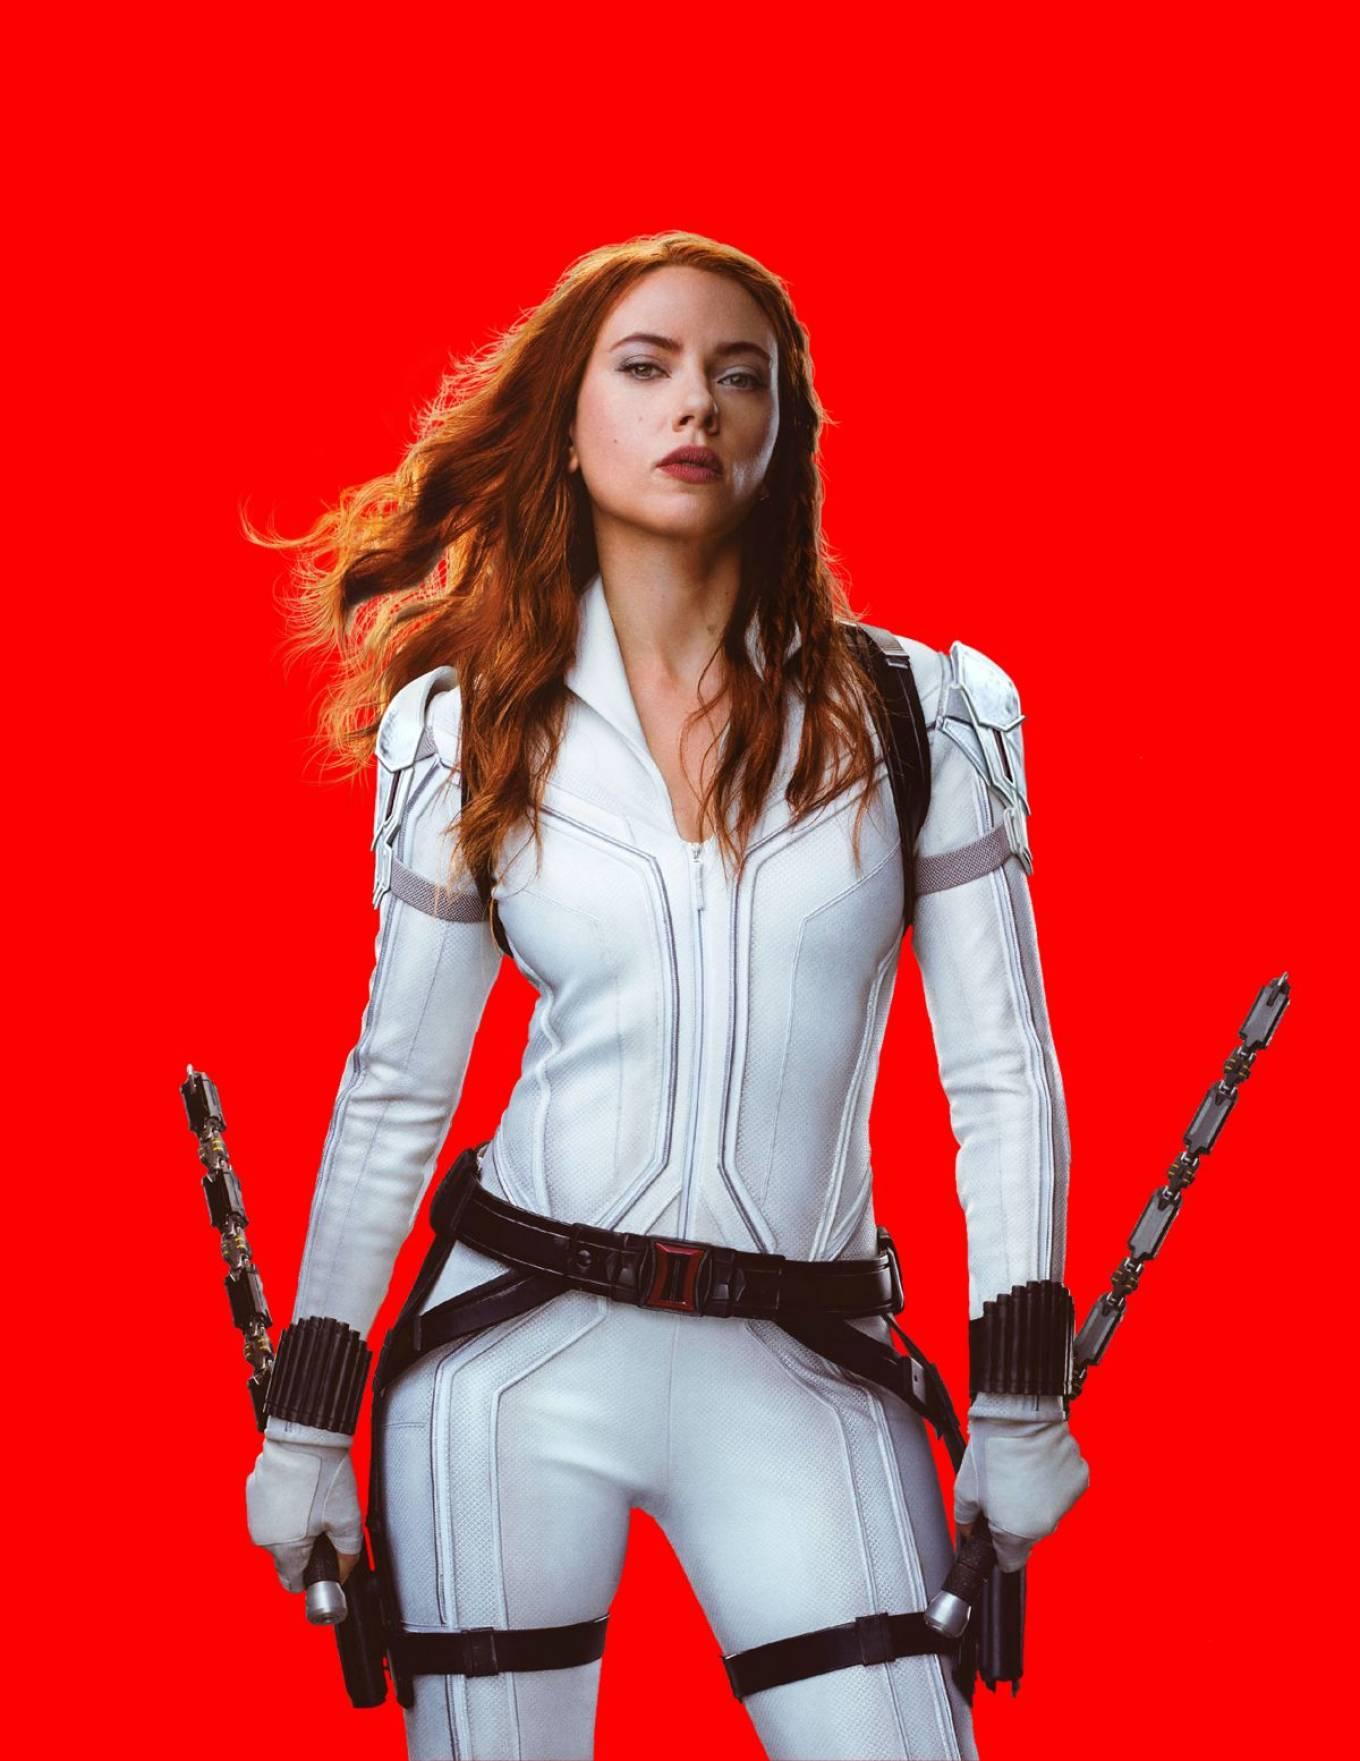 Scarlett Johansson 2020 : Scarlett Johansson – Black Widow 2021 Promos-04